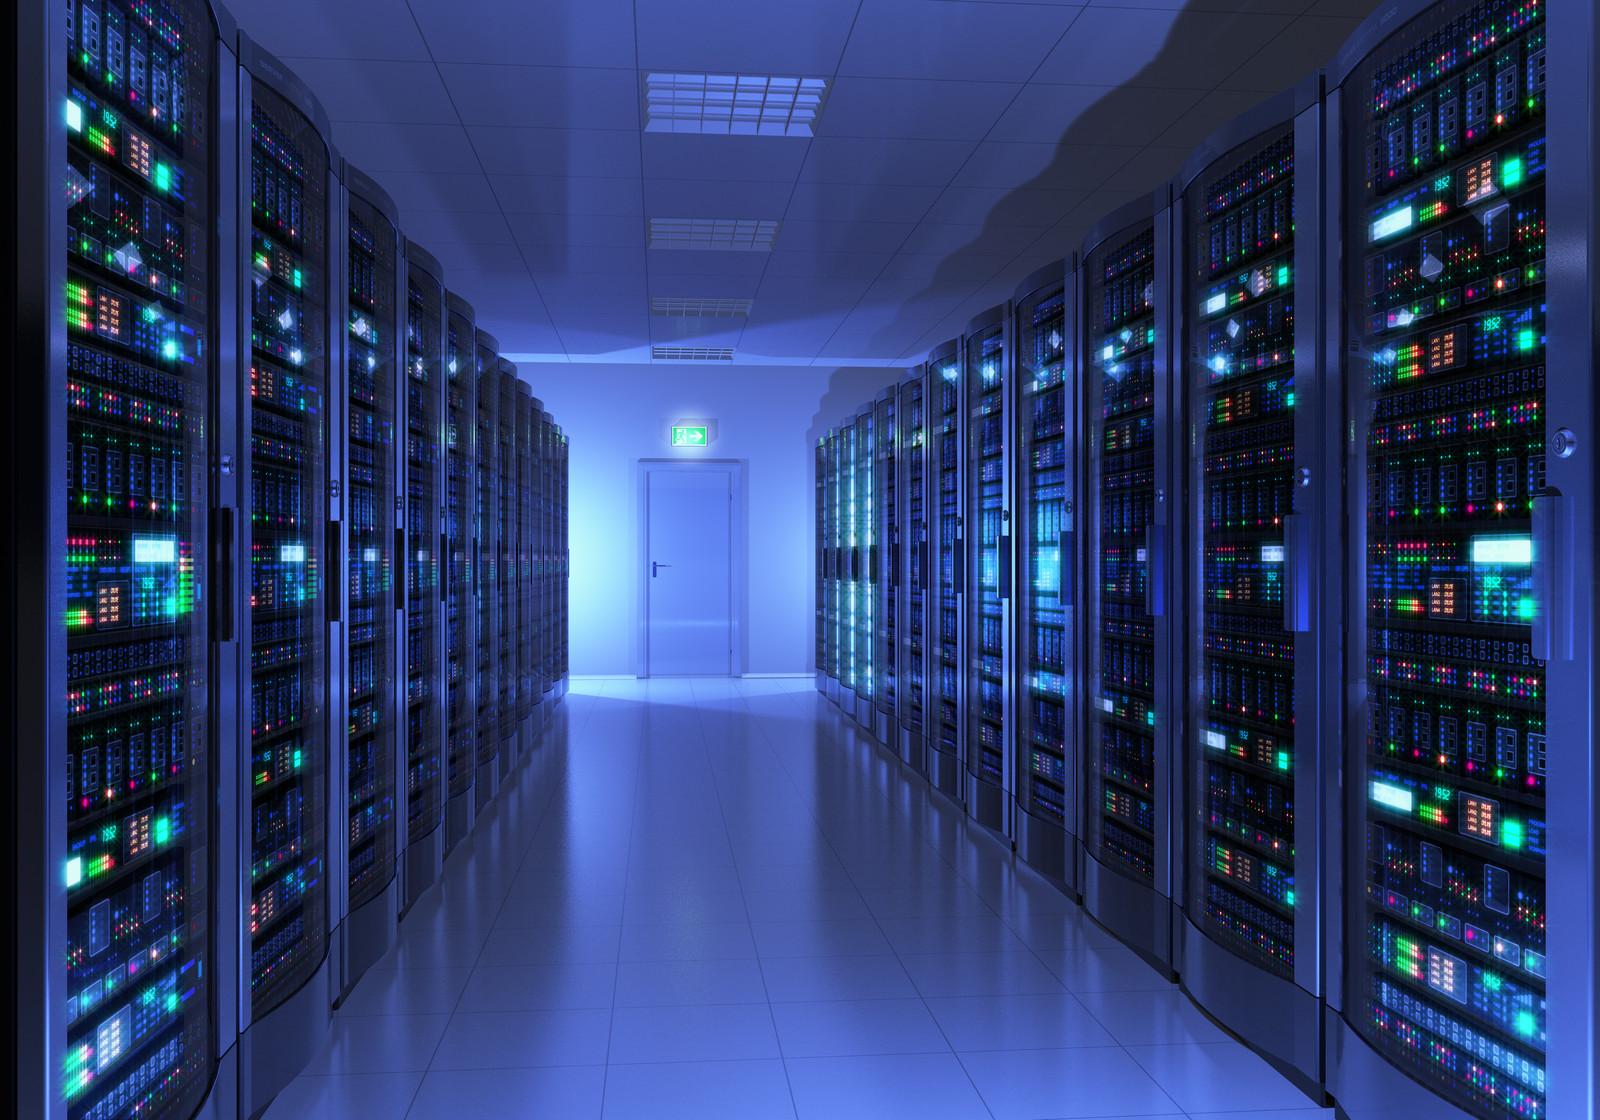 Картинки по запиту Hurricane Electric data center